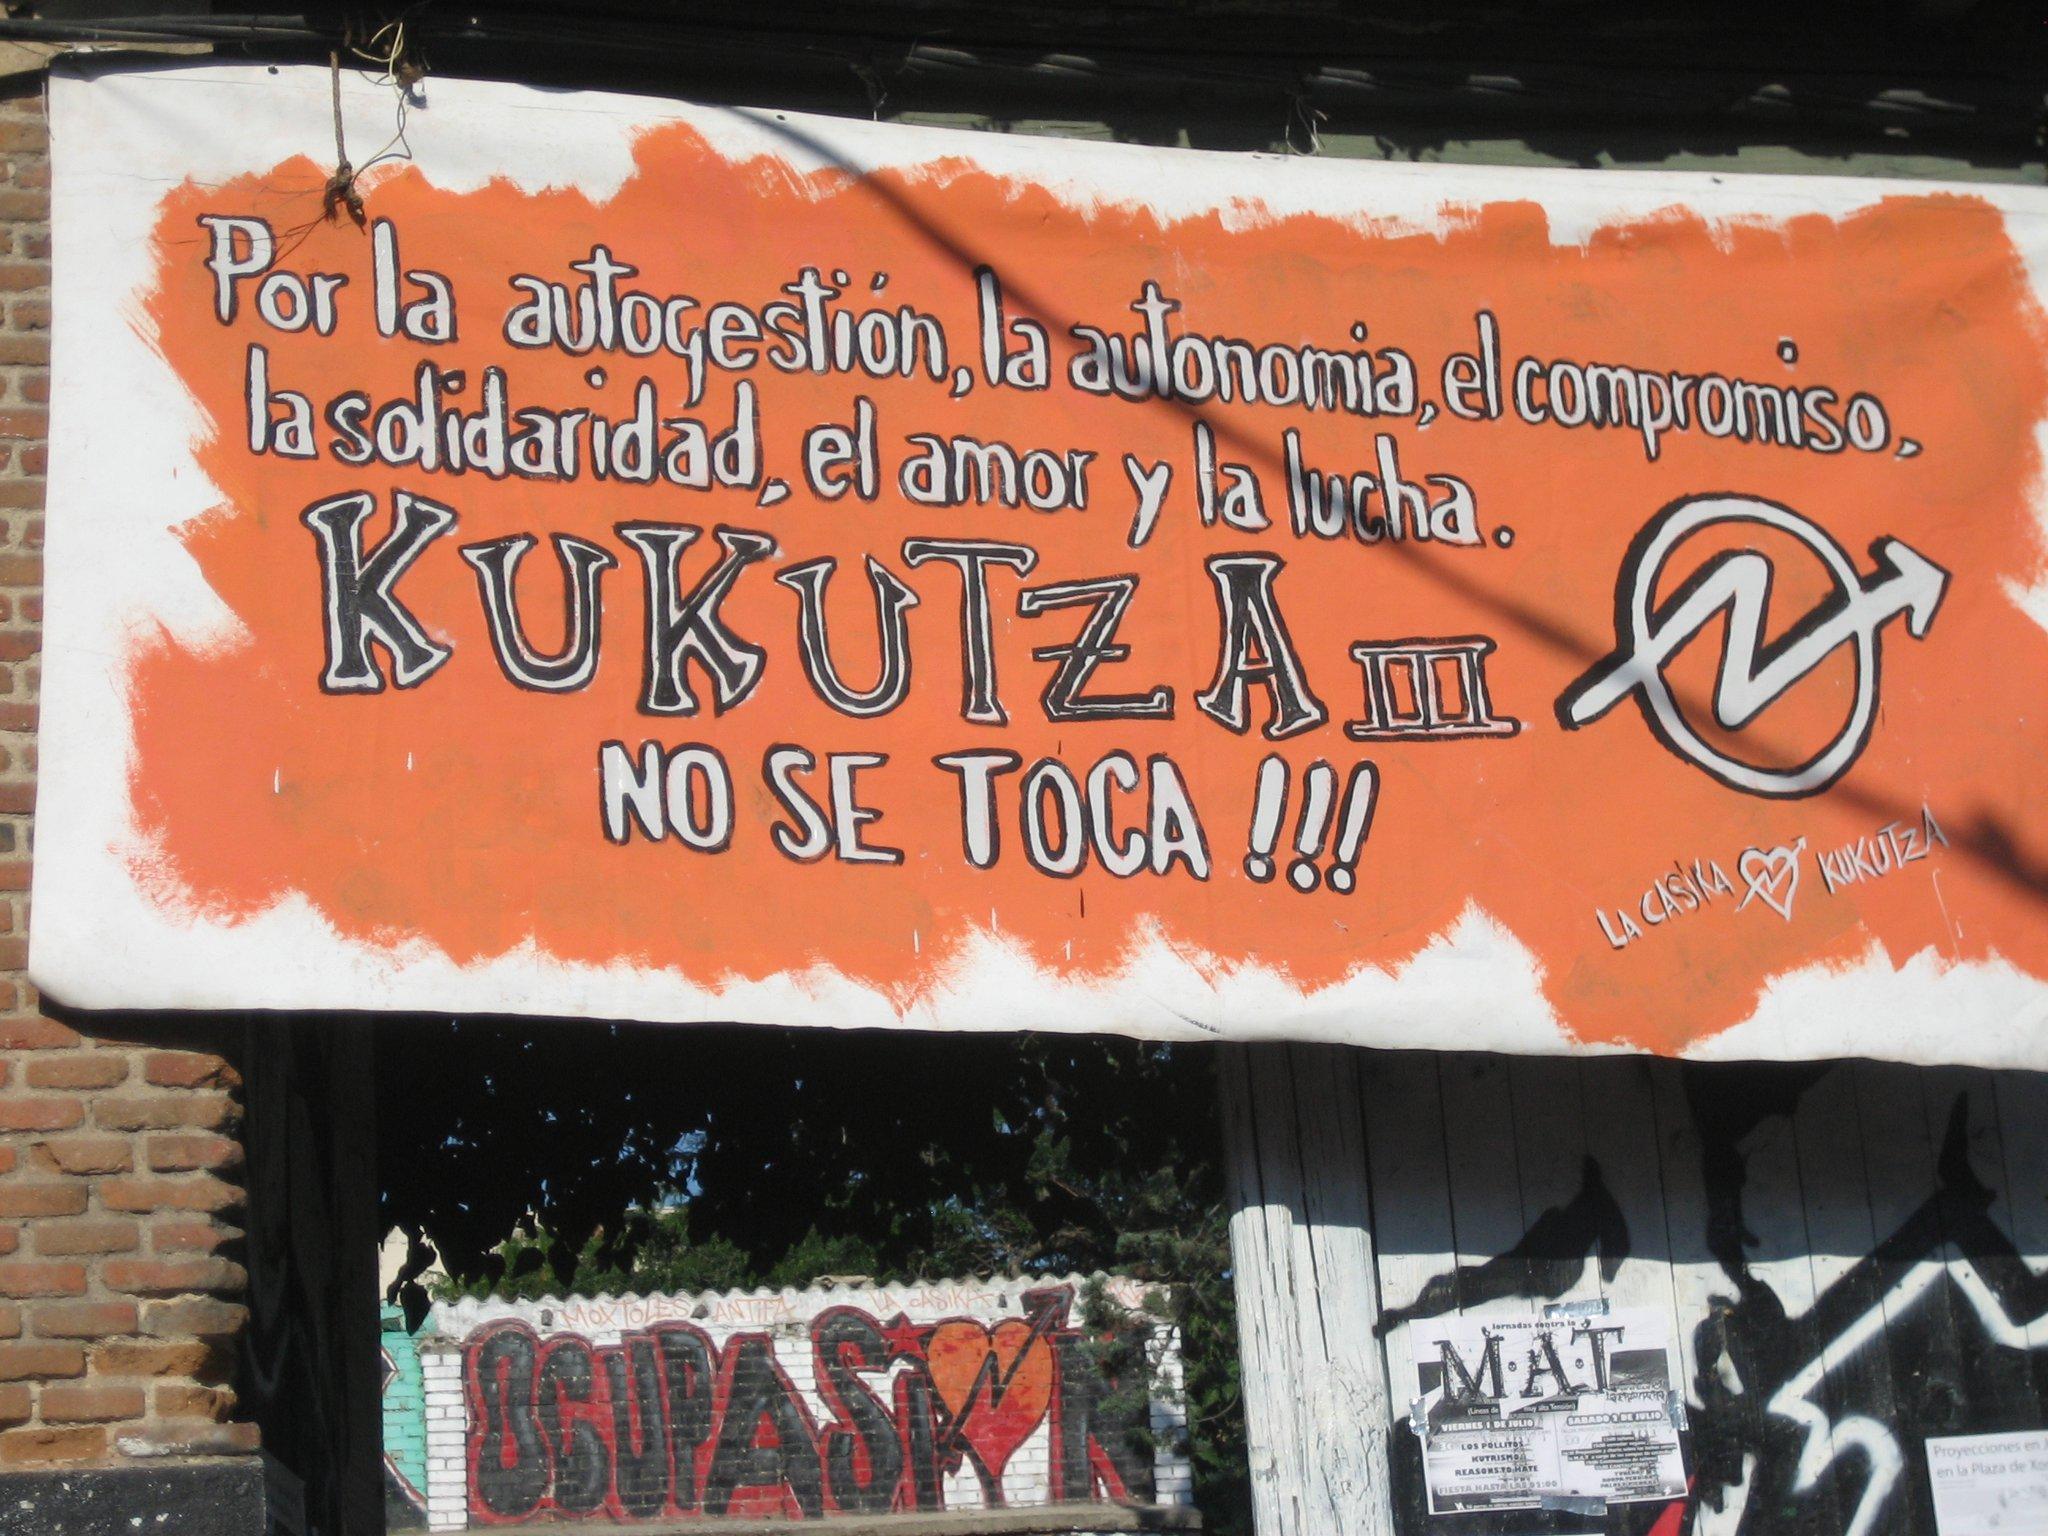 kukutza no se toca pancarta en la casika